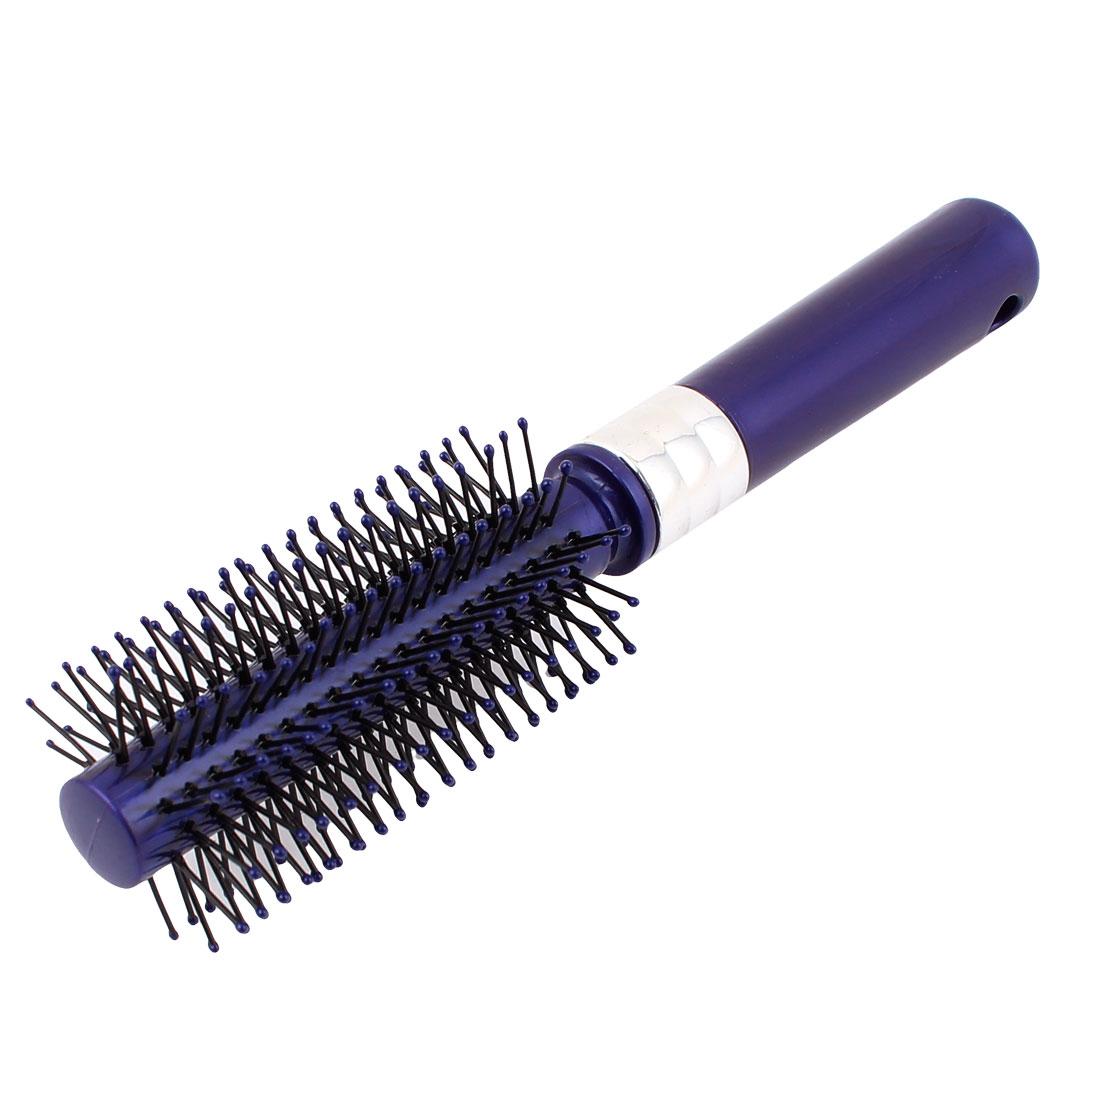 Plastic Grip Curly Hair Salon Styling Bristles Brush Comb Black Dark Purple